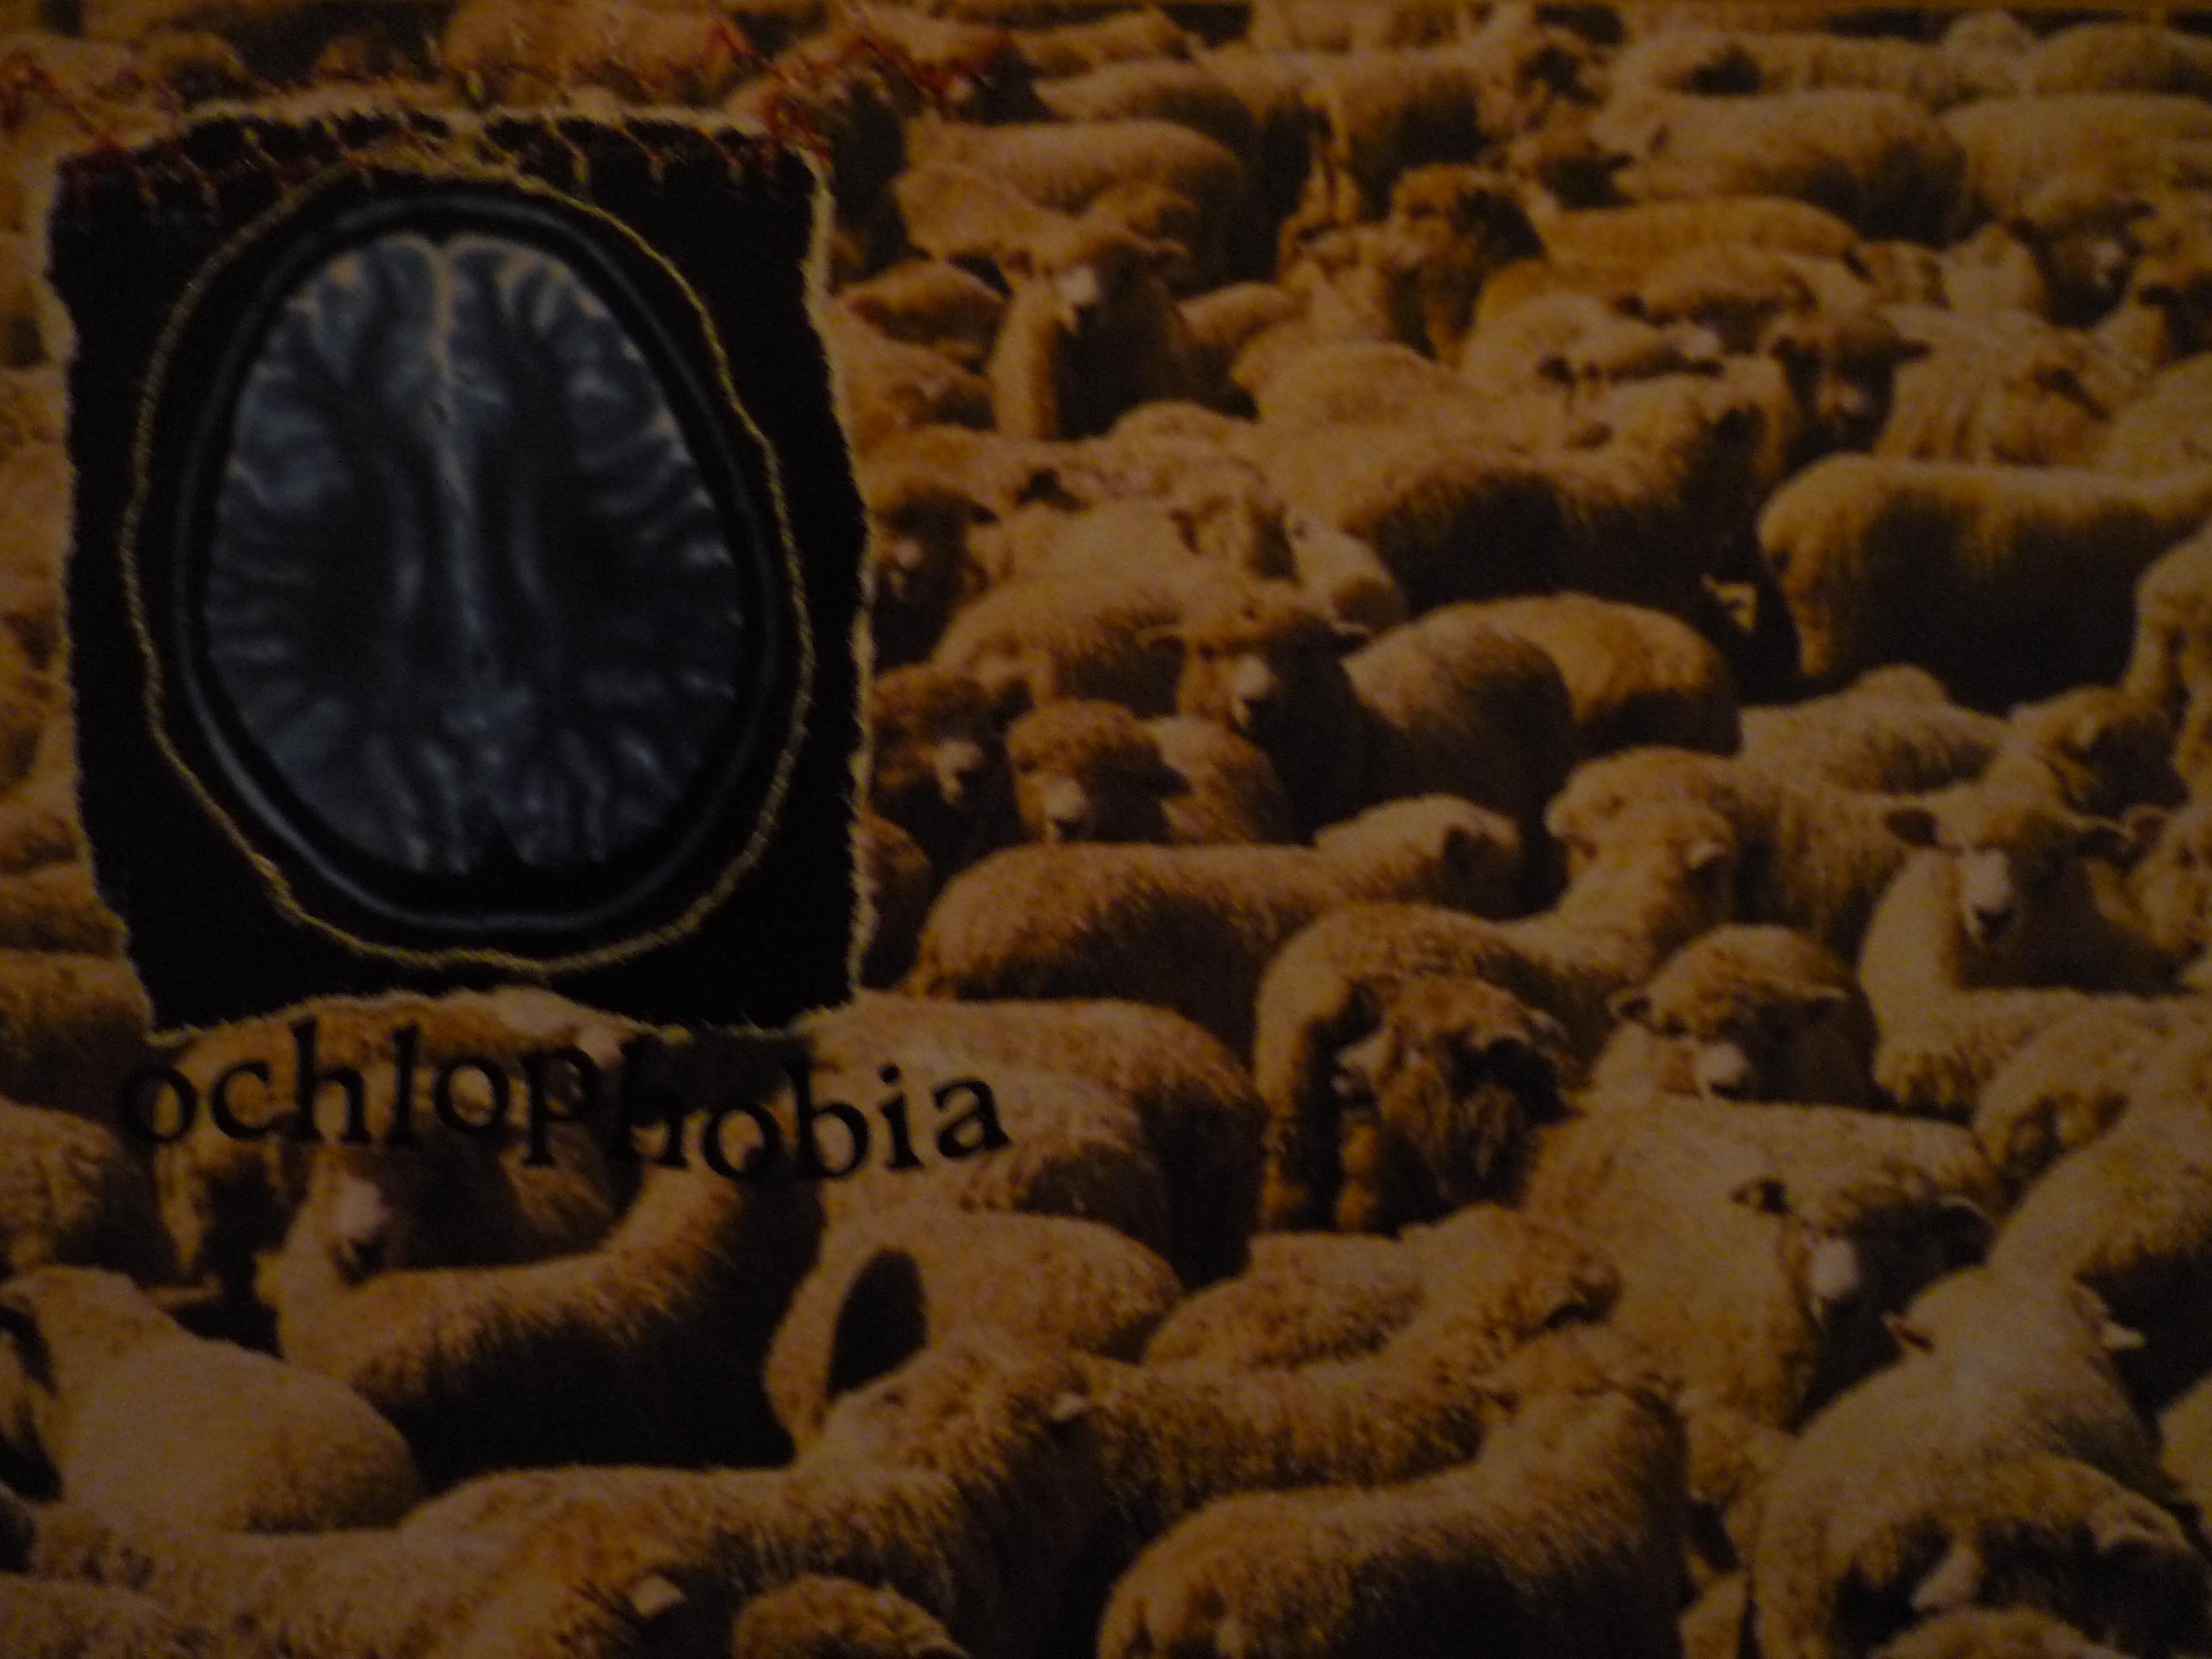 Phobia - ochlophobia (fear of crowds)